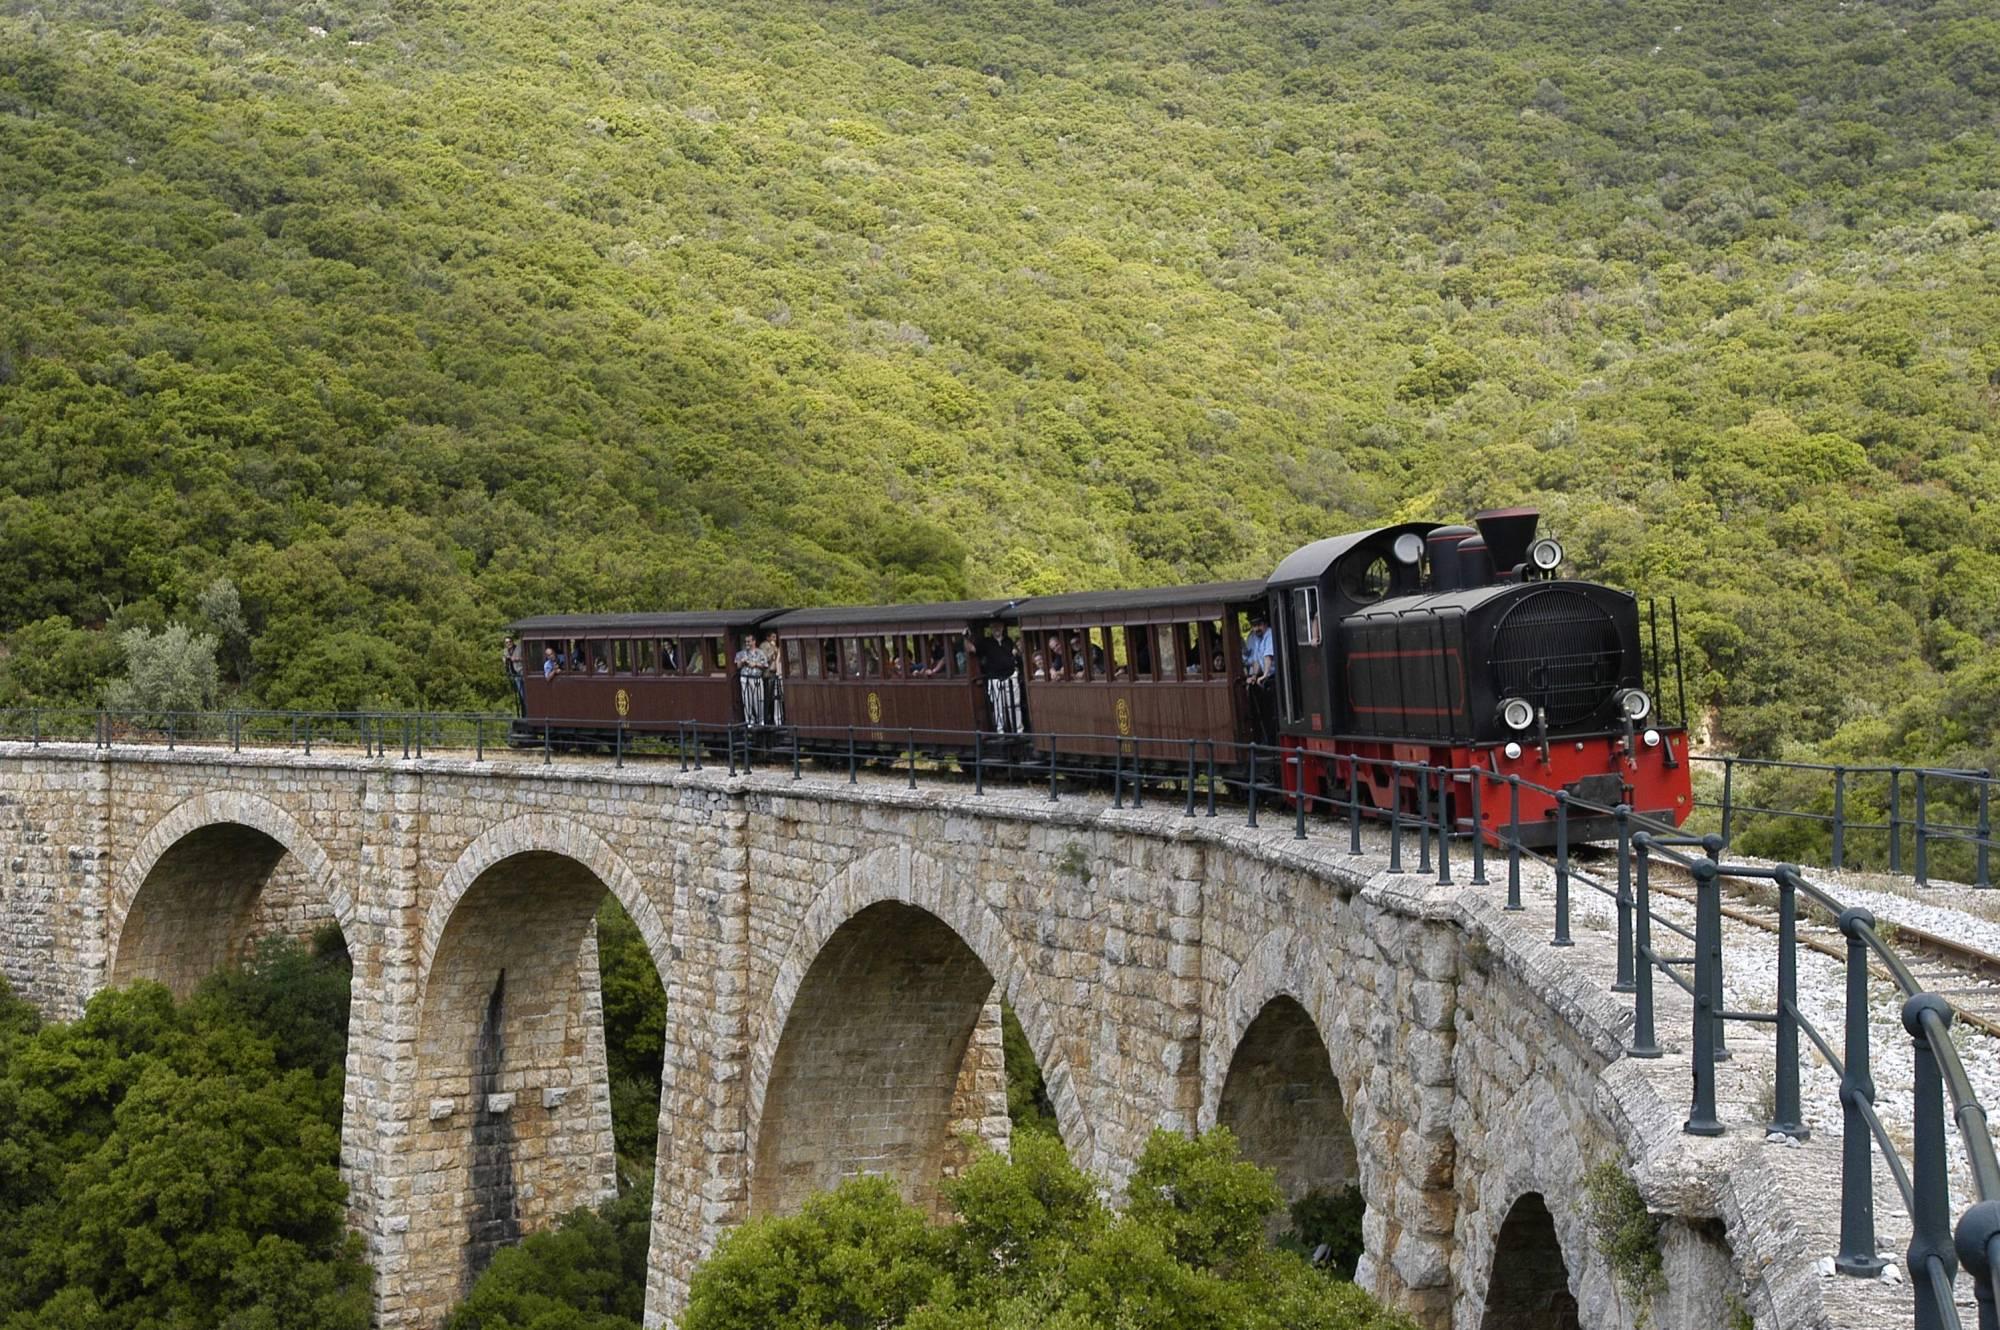 Pelion train to Milies